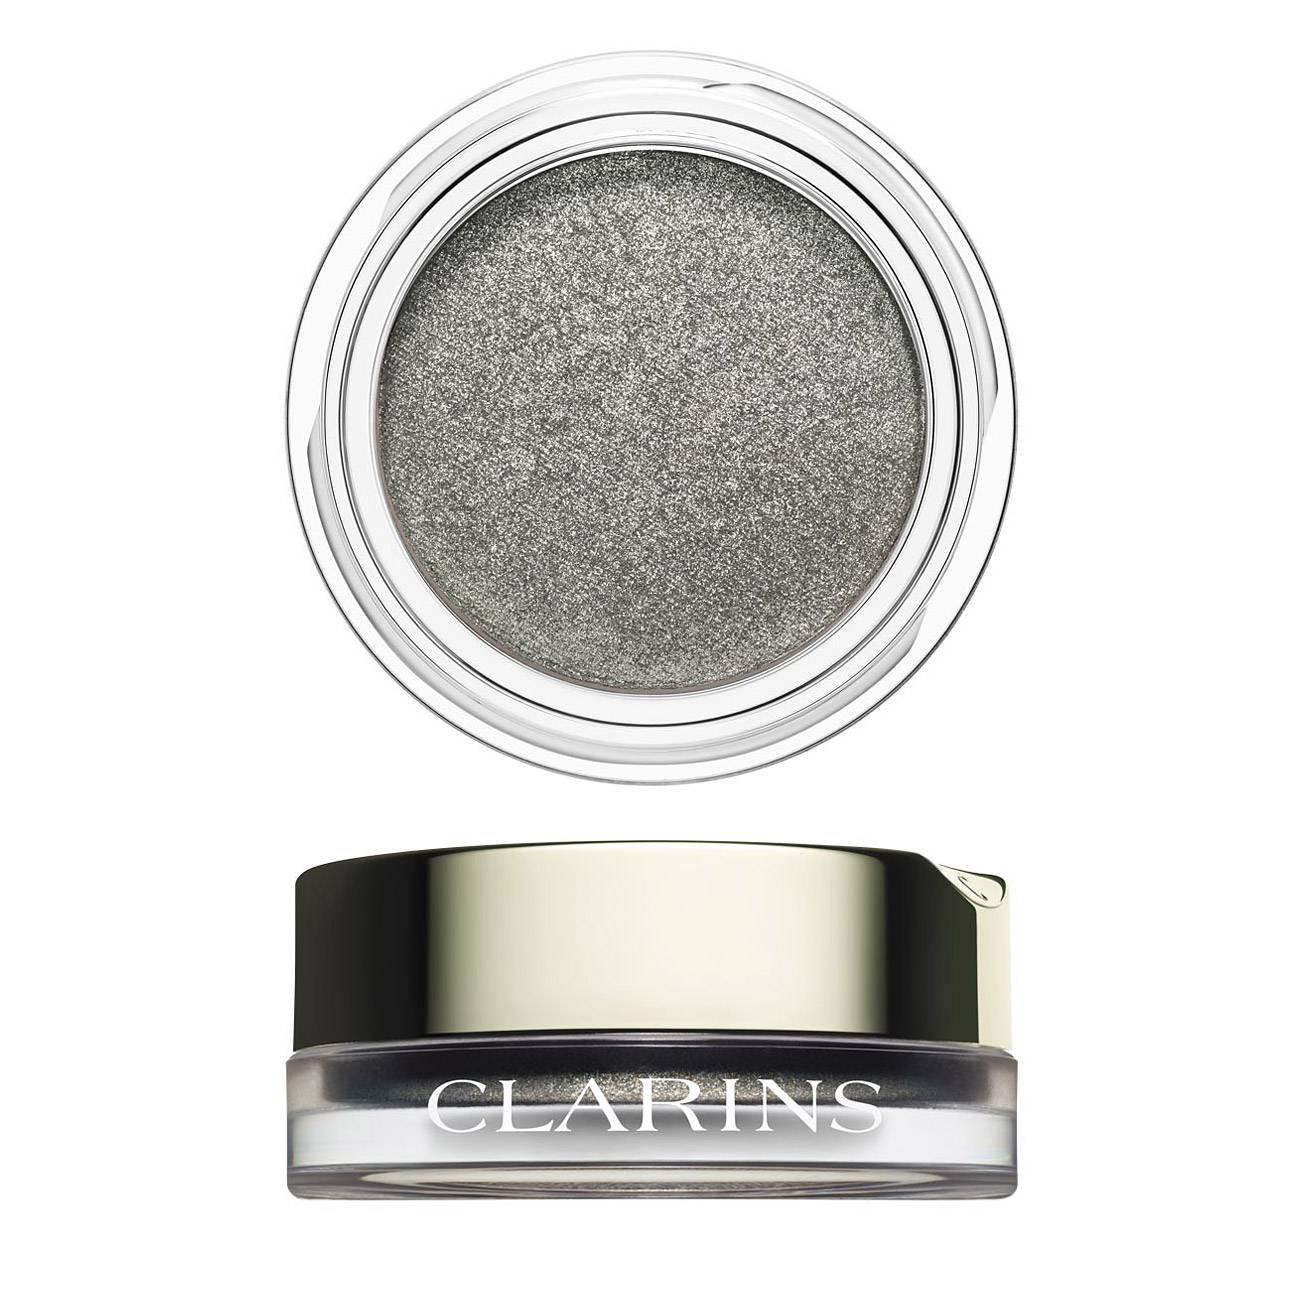 Iridescent Eyeshadow 7 Ml 06 Clarins imagine 2021 bestvalue.eu